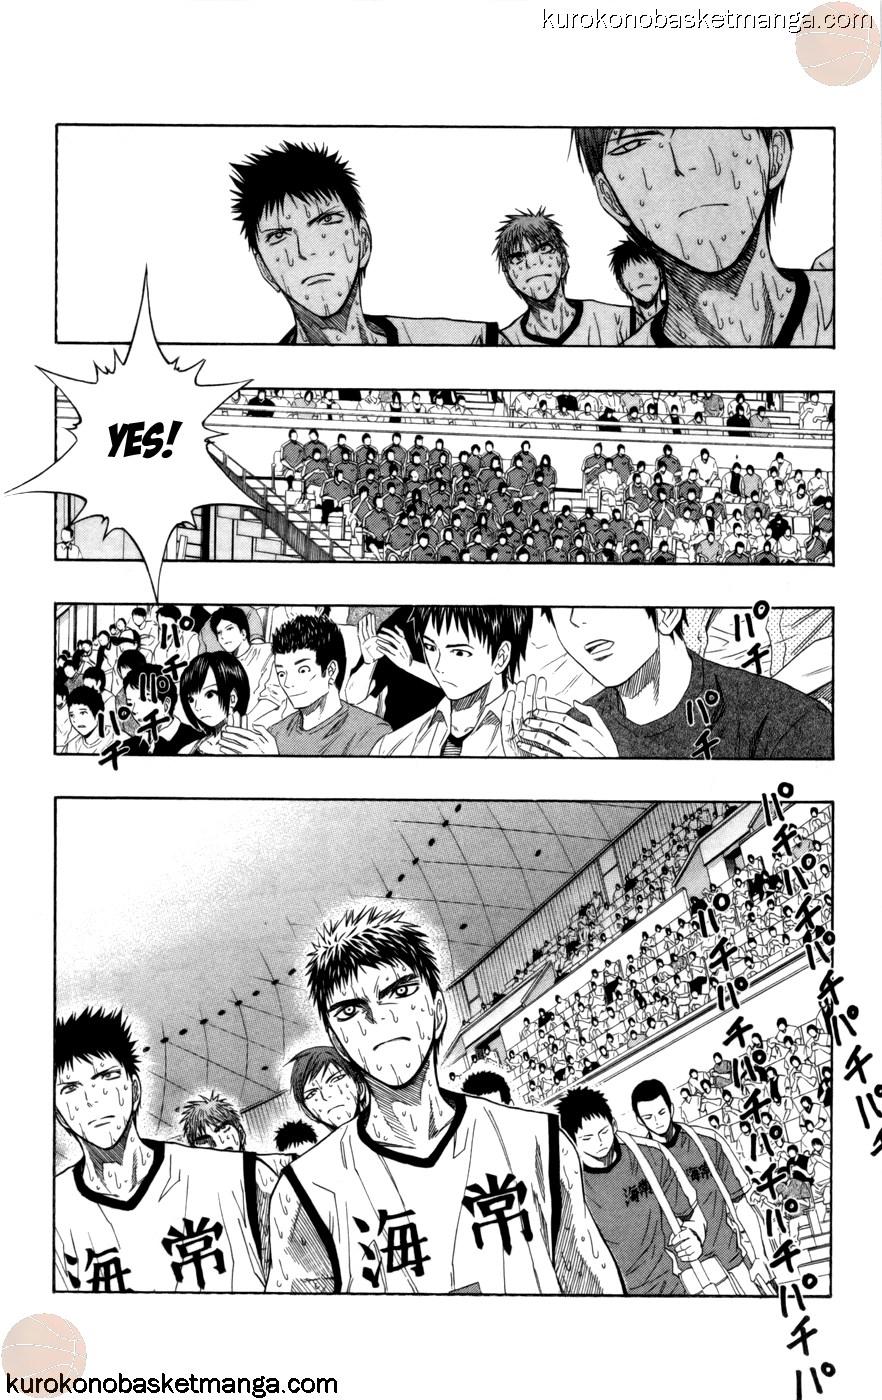 Kuroko no Basket Manga Chapter 73 - Image 10